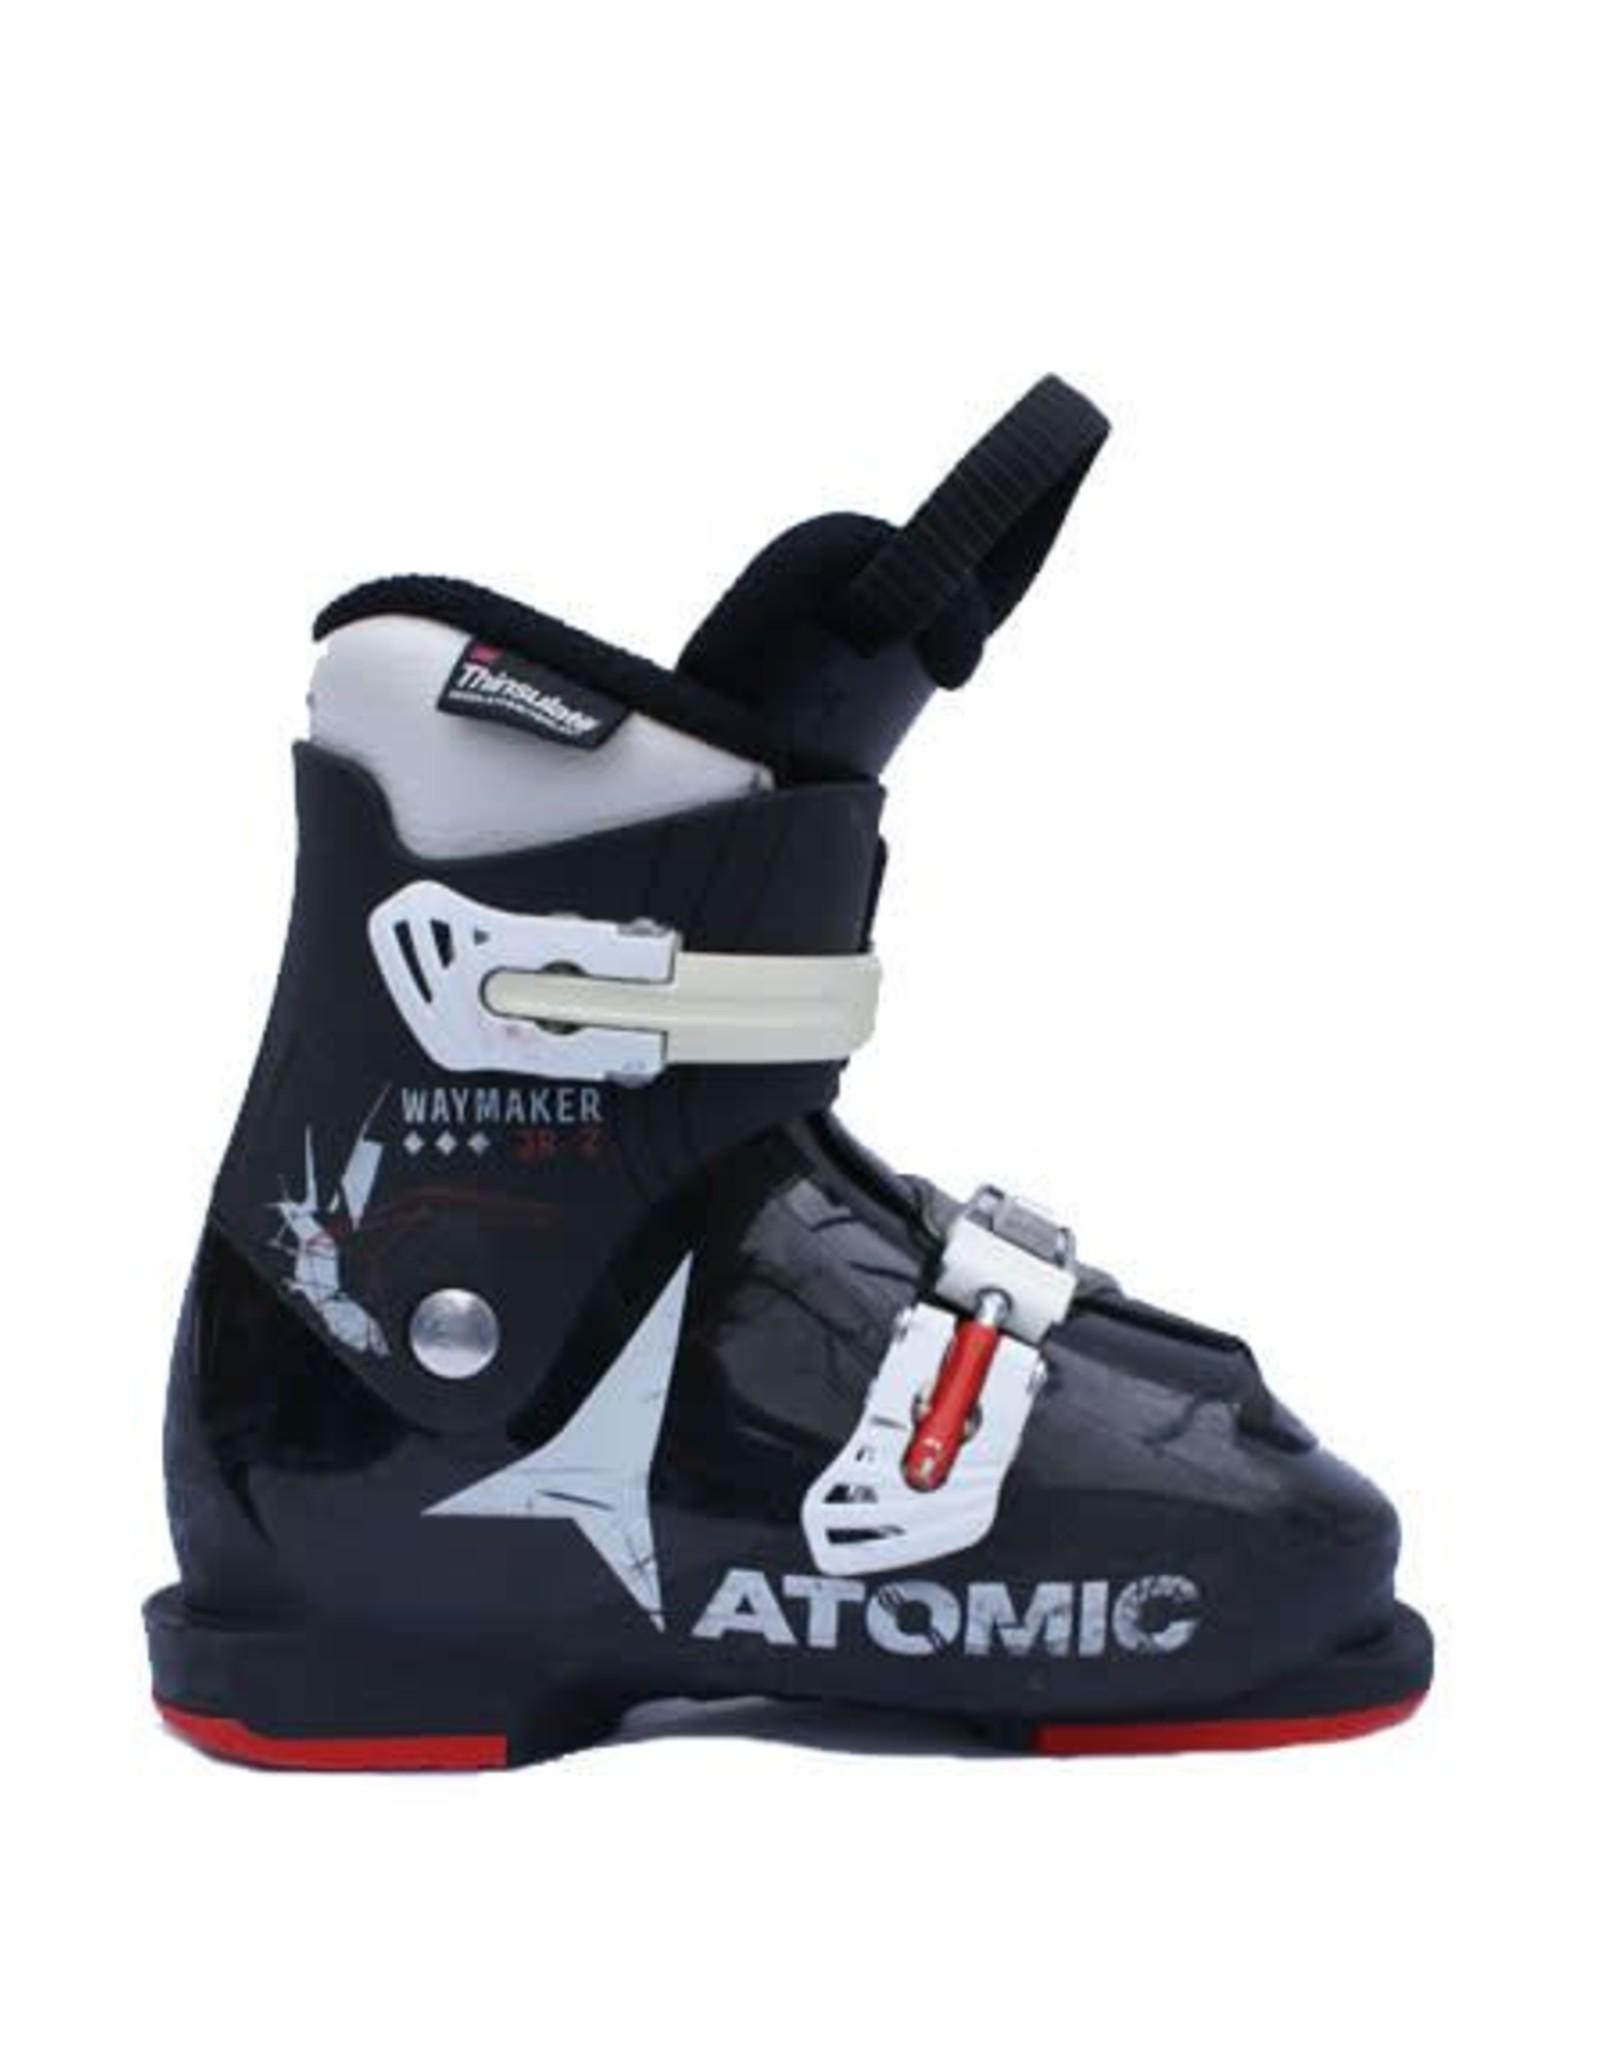 ATOMIC Skischoenen Atomic Waymaker JR 2 Zw/Wit/Rood Gebruikt